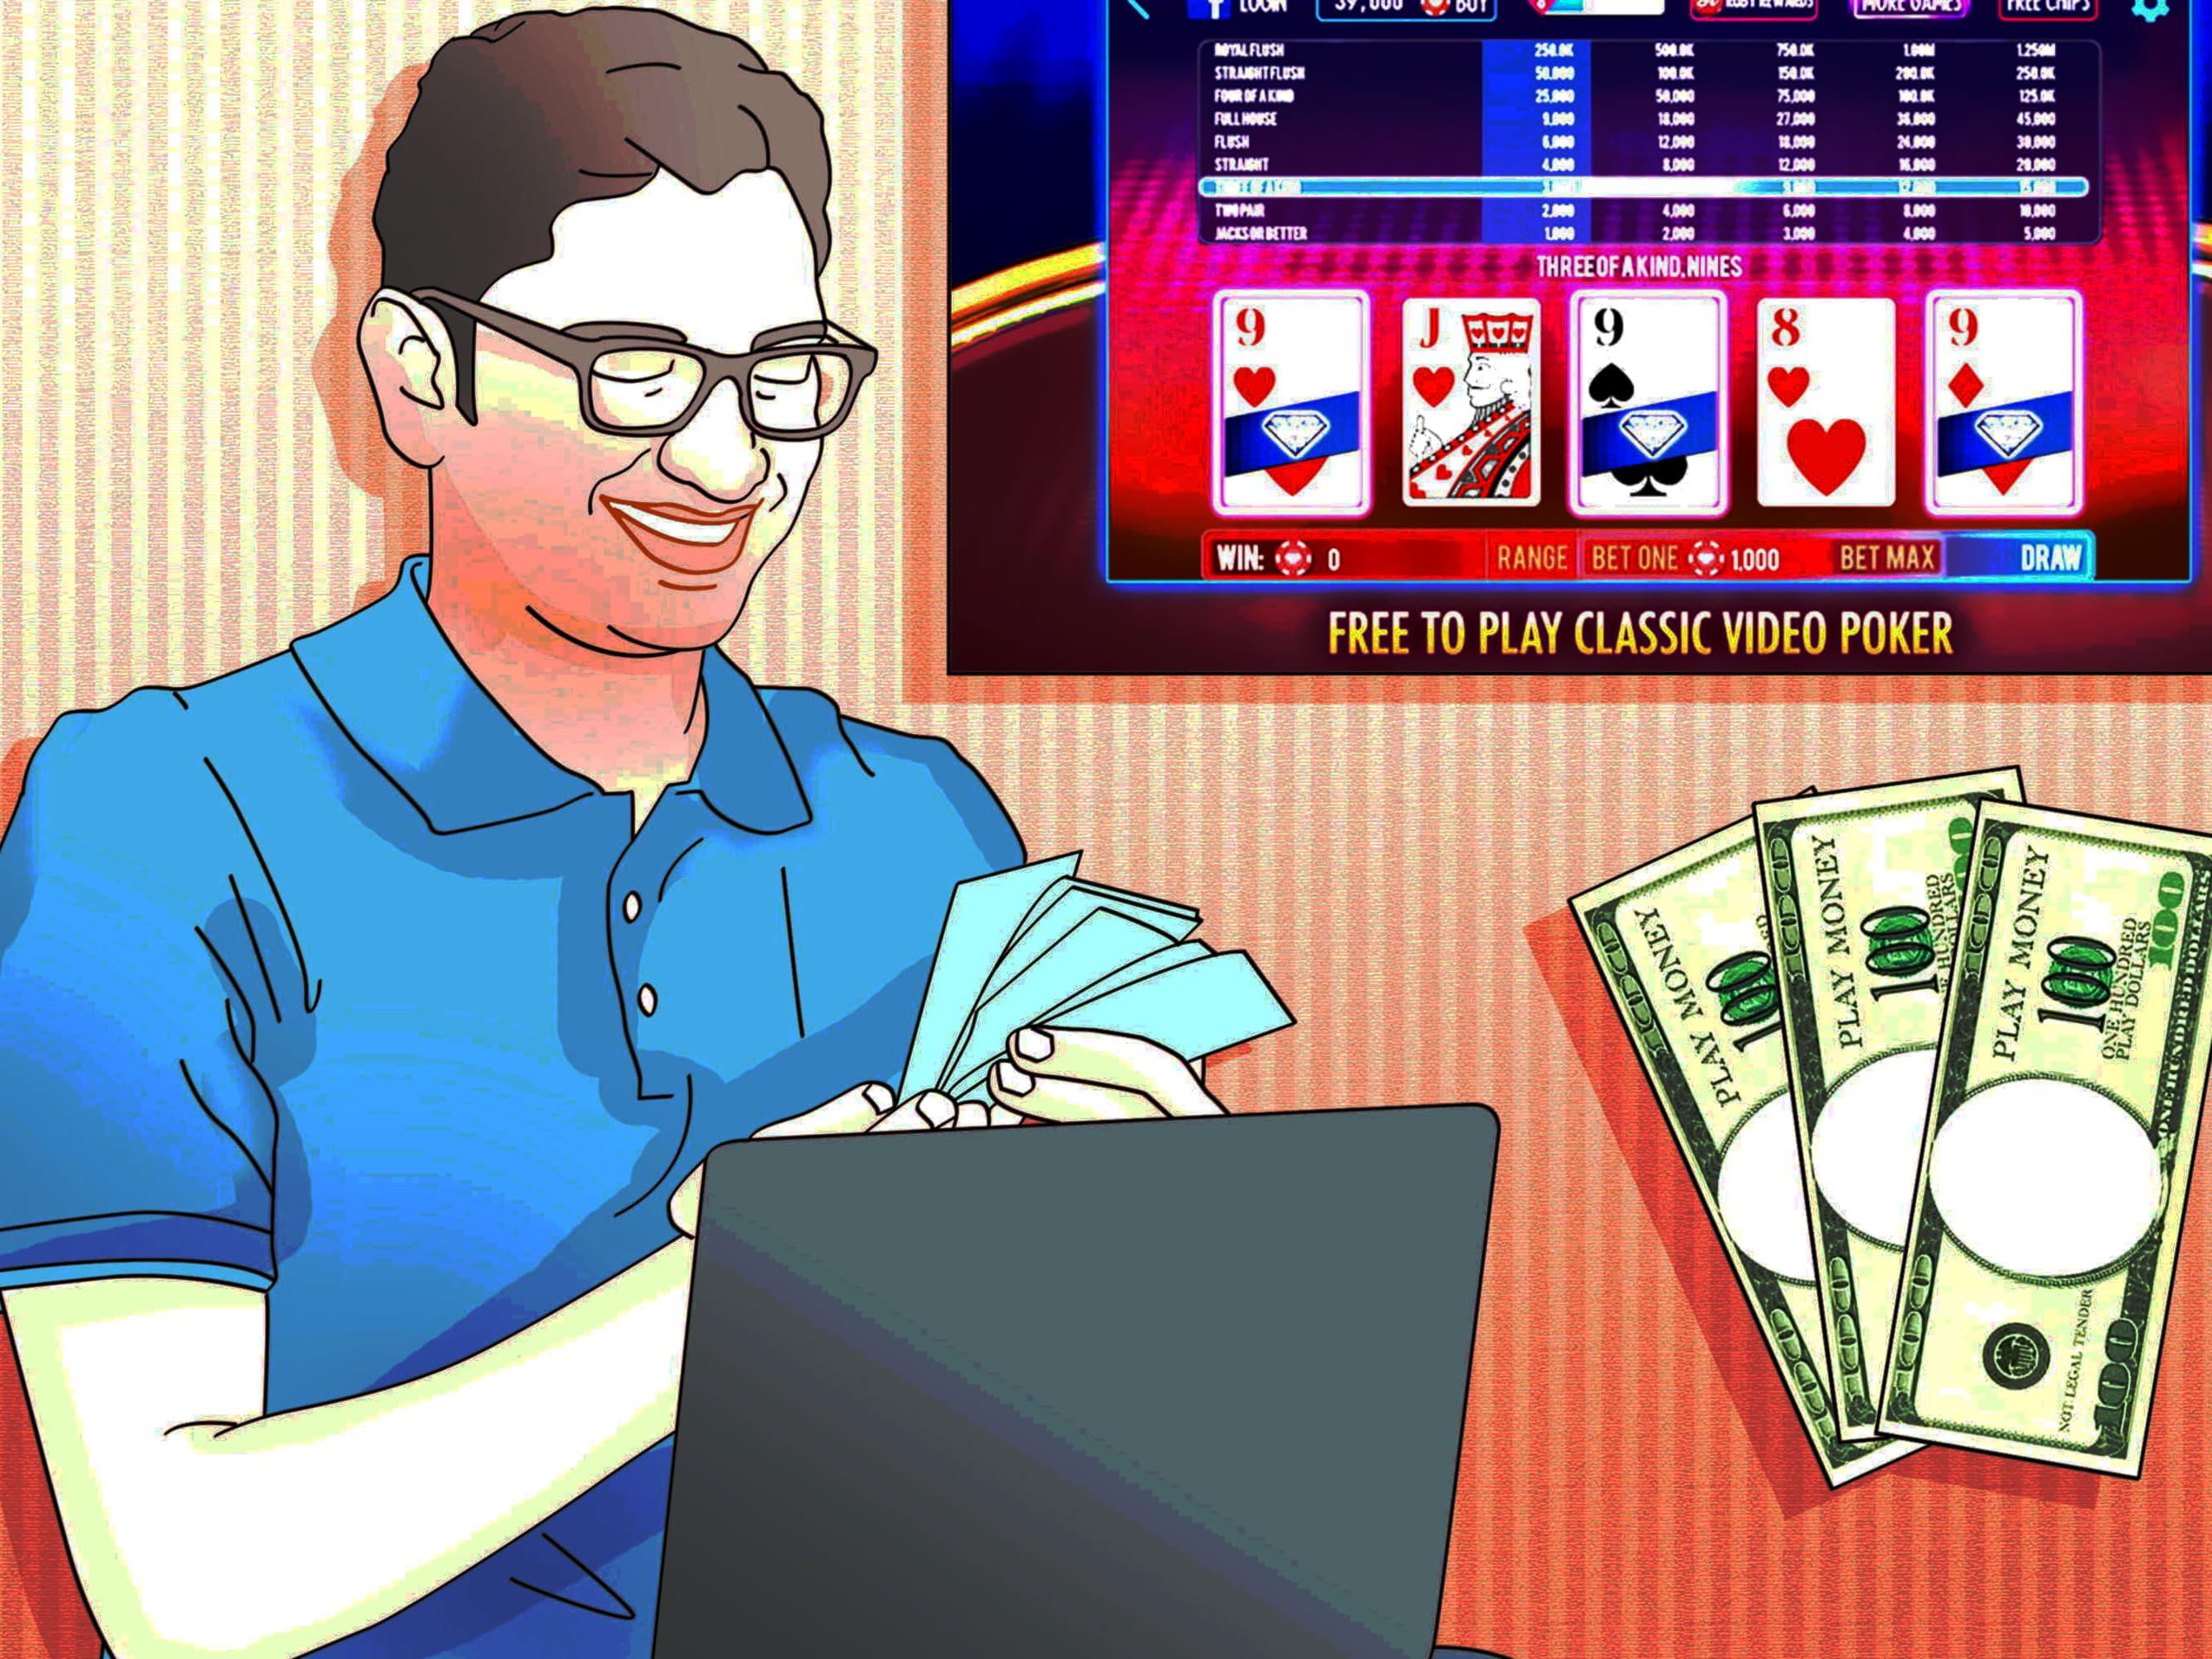 760% Casino match bonus at 888 Casino